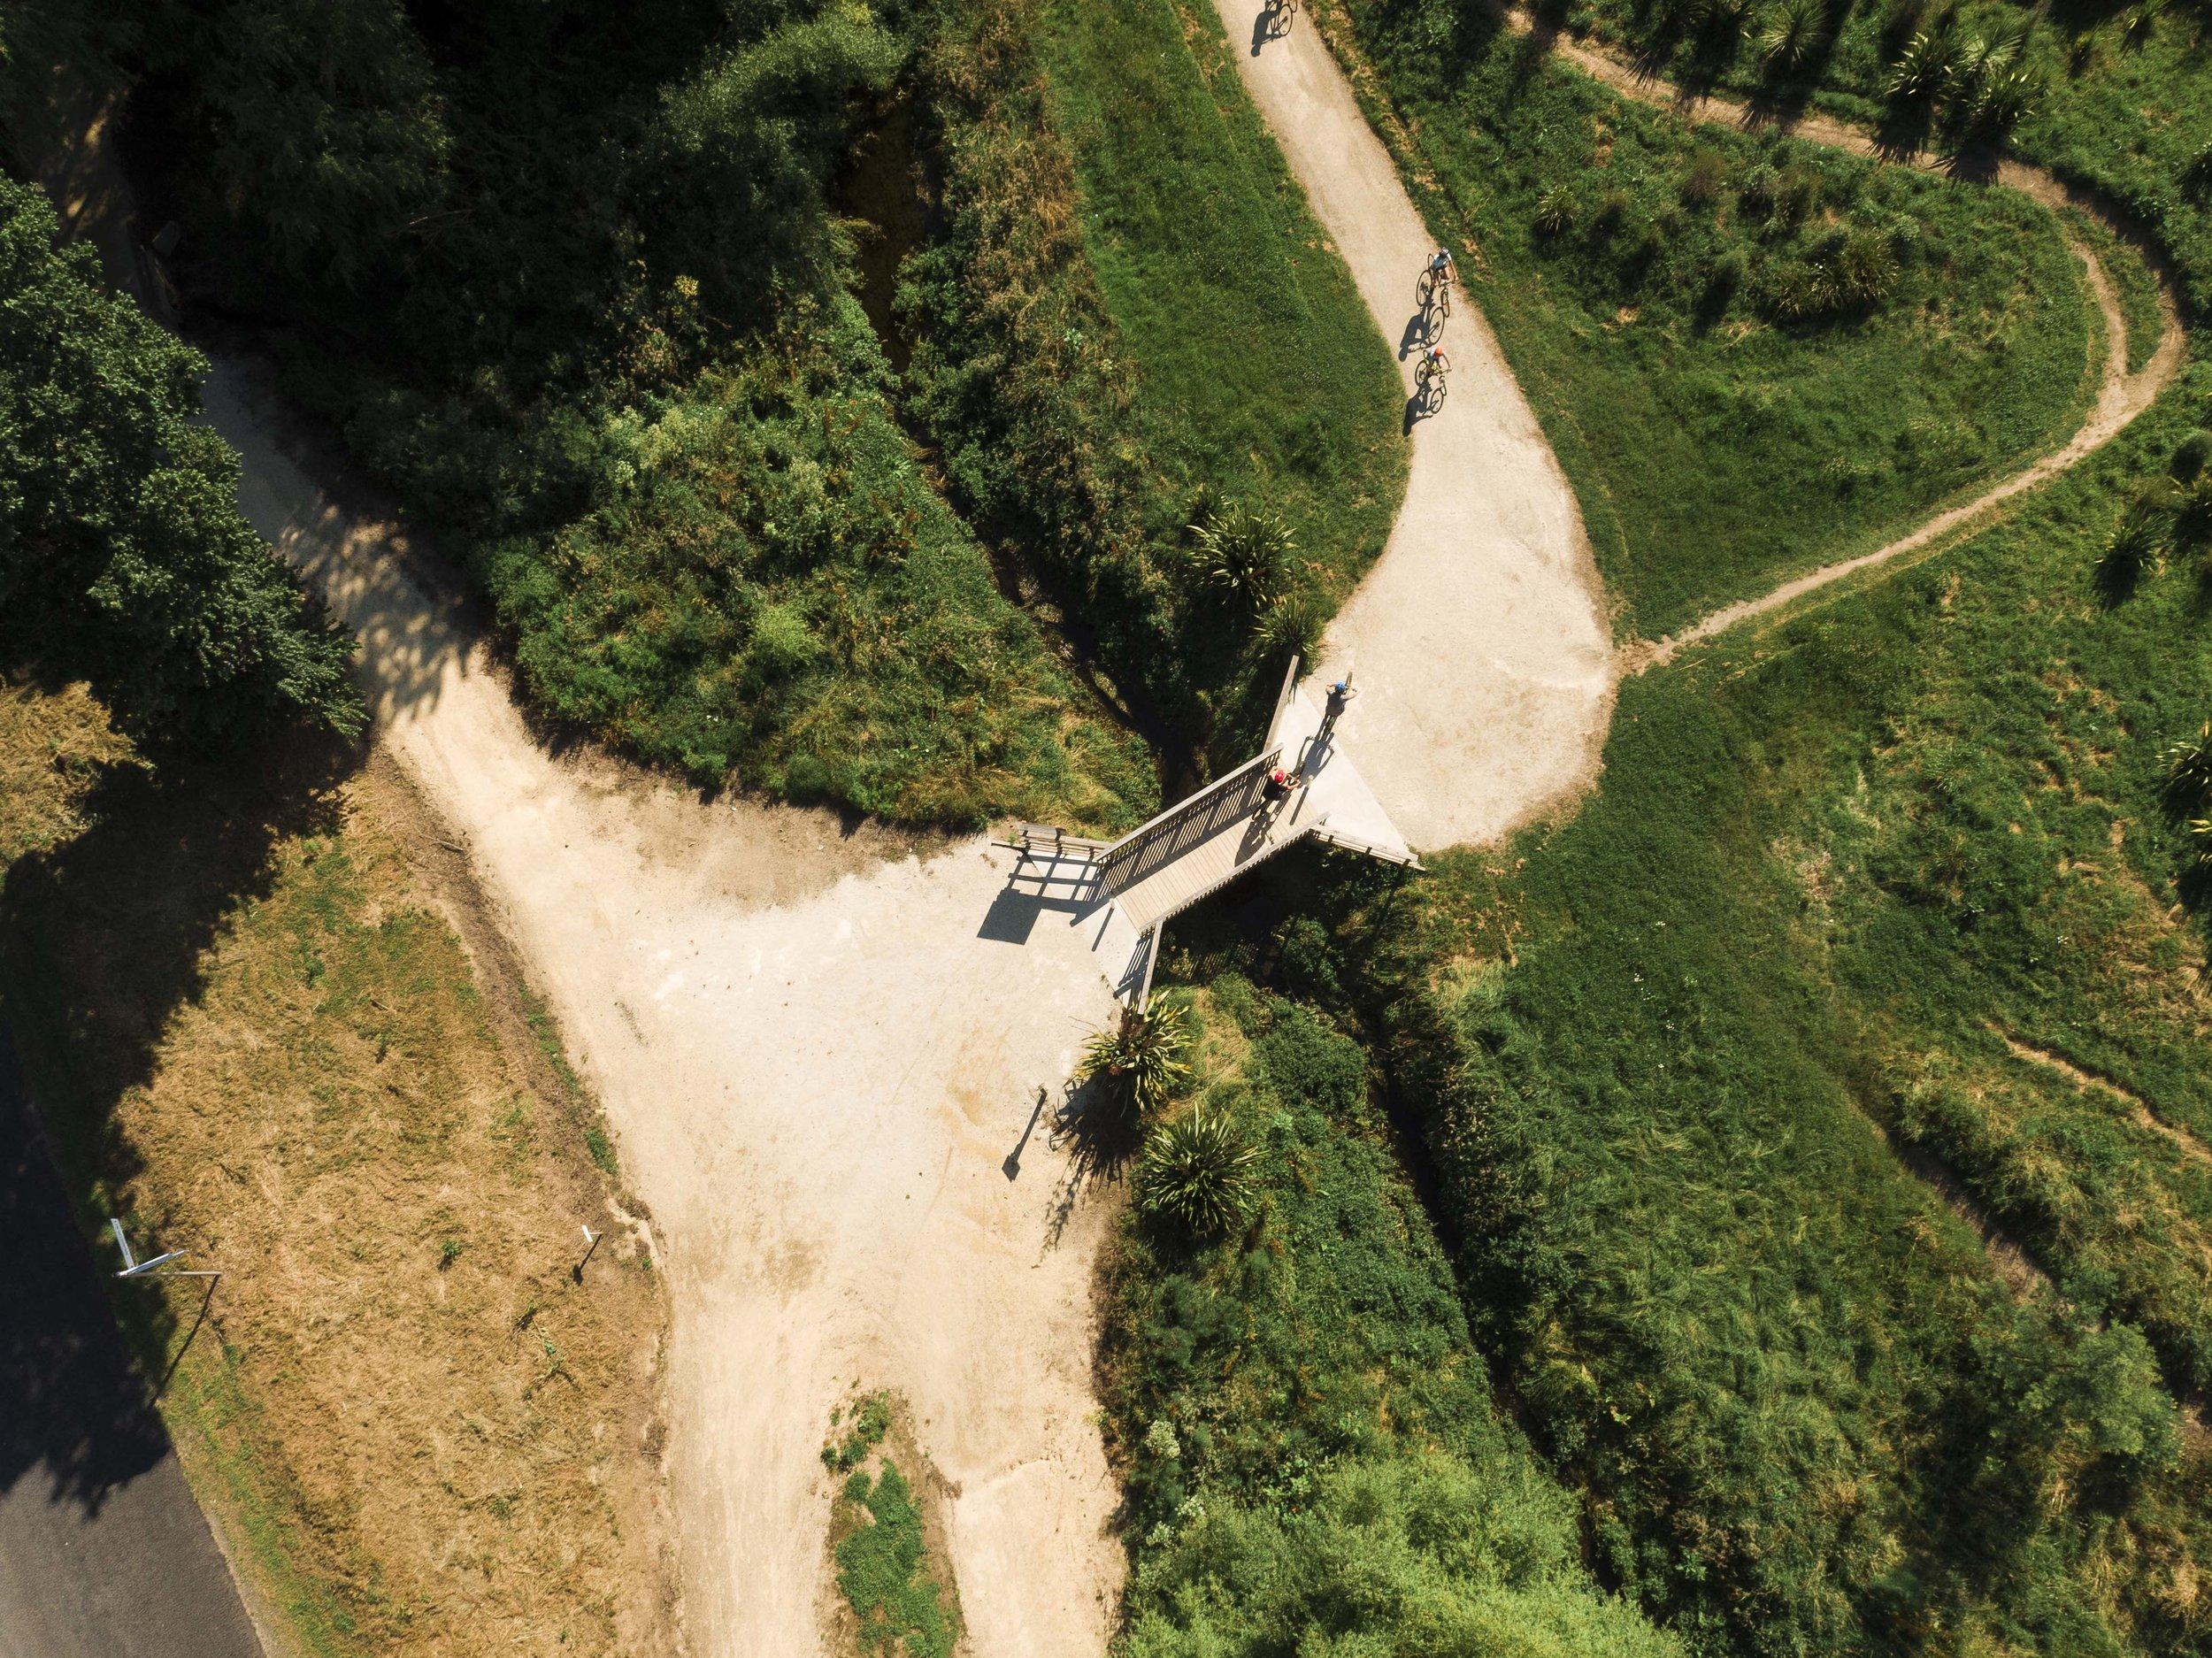 Tuki Tuki Trail